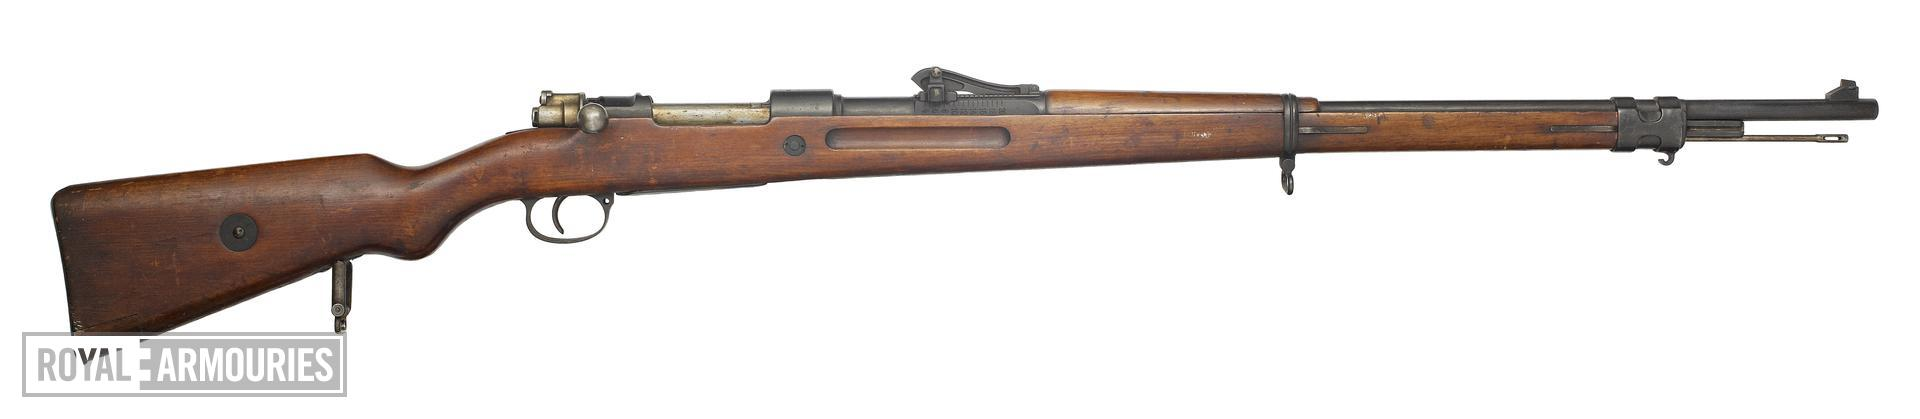 Centrefire bolt-action magazine military rifle - Mauser Gewehr 98 rifle